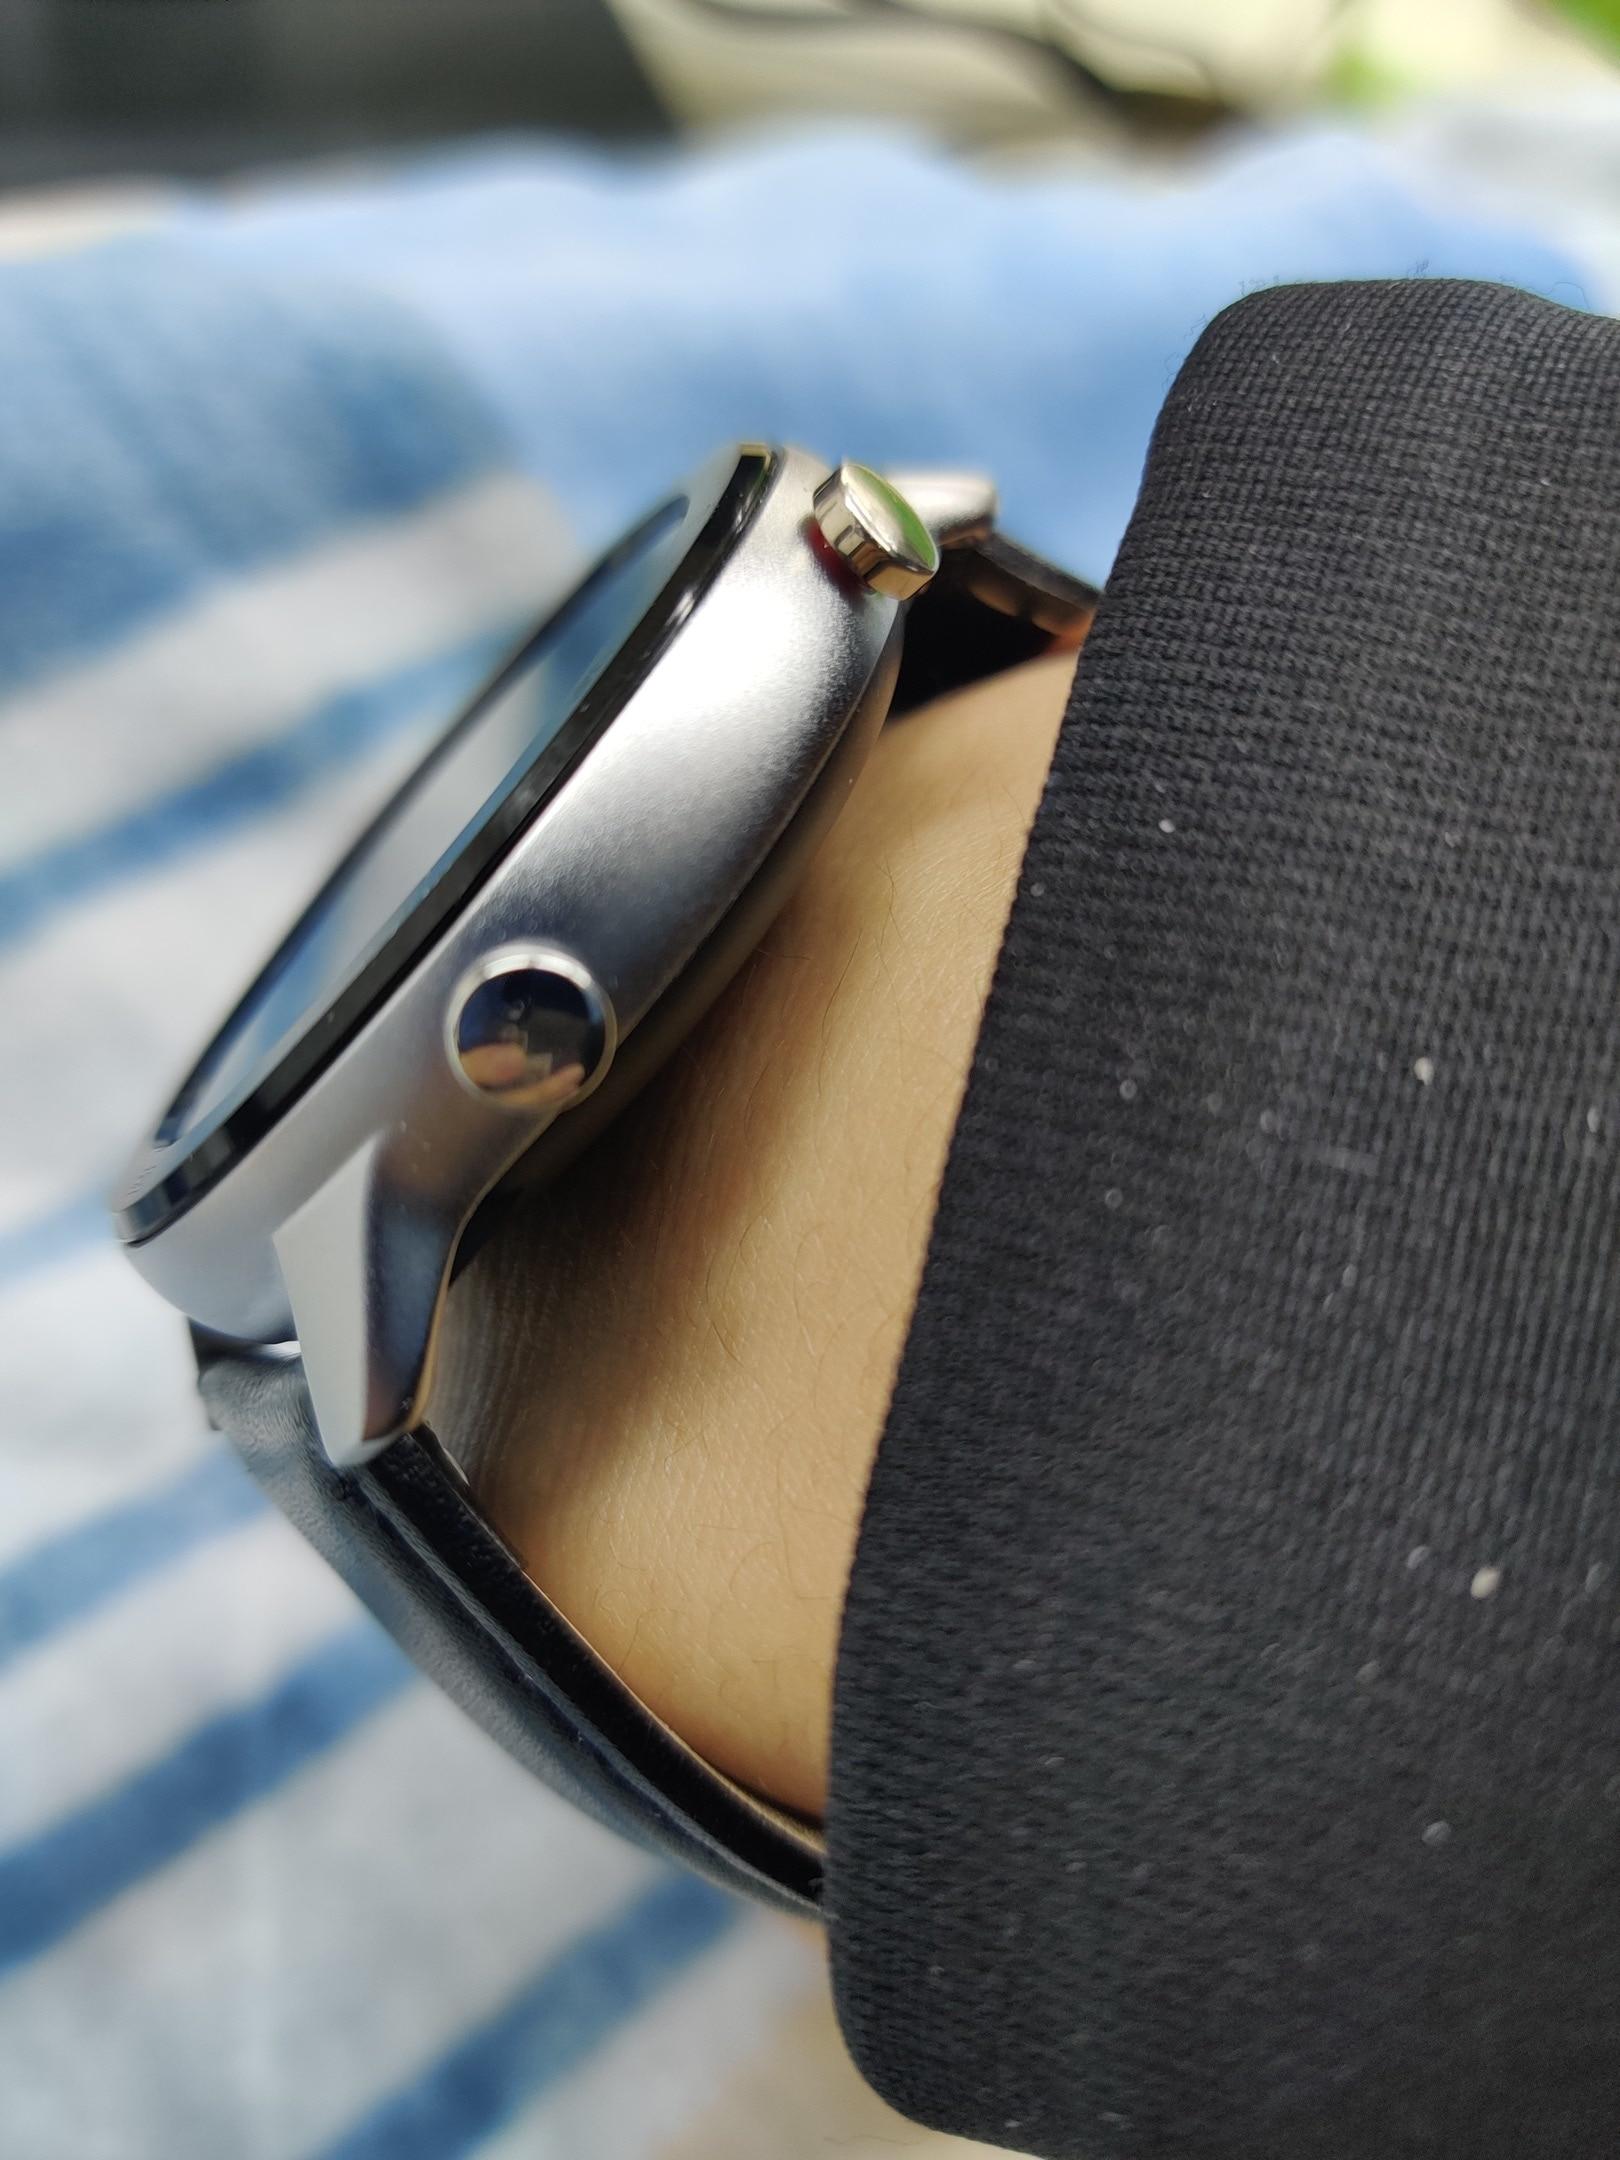 LEMFO Smart Watch Full Touch Screen Heart Rate Blood pressure Monitor IP68 Waterproof Smartwatch Men Women for Huawei Android|Smart Watches|   - AliExpress